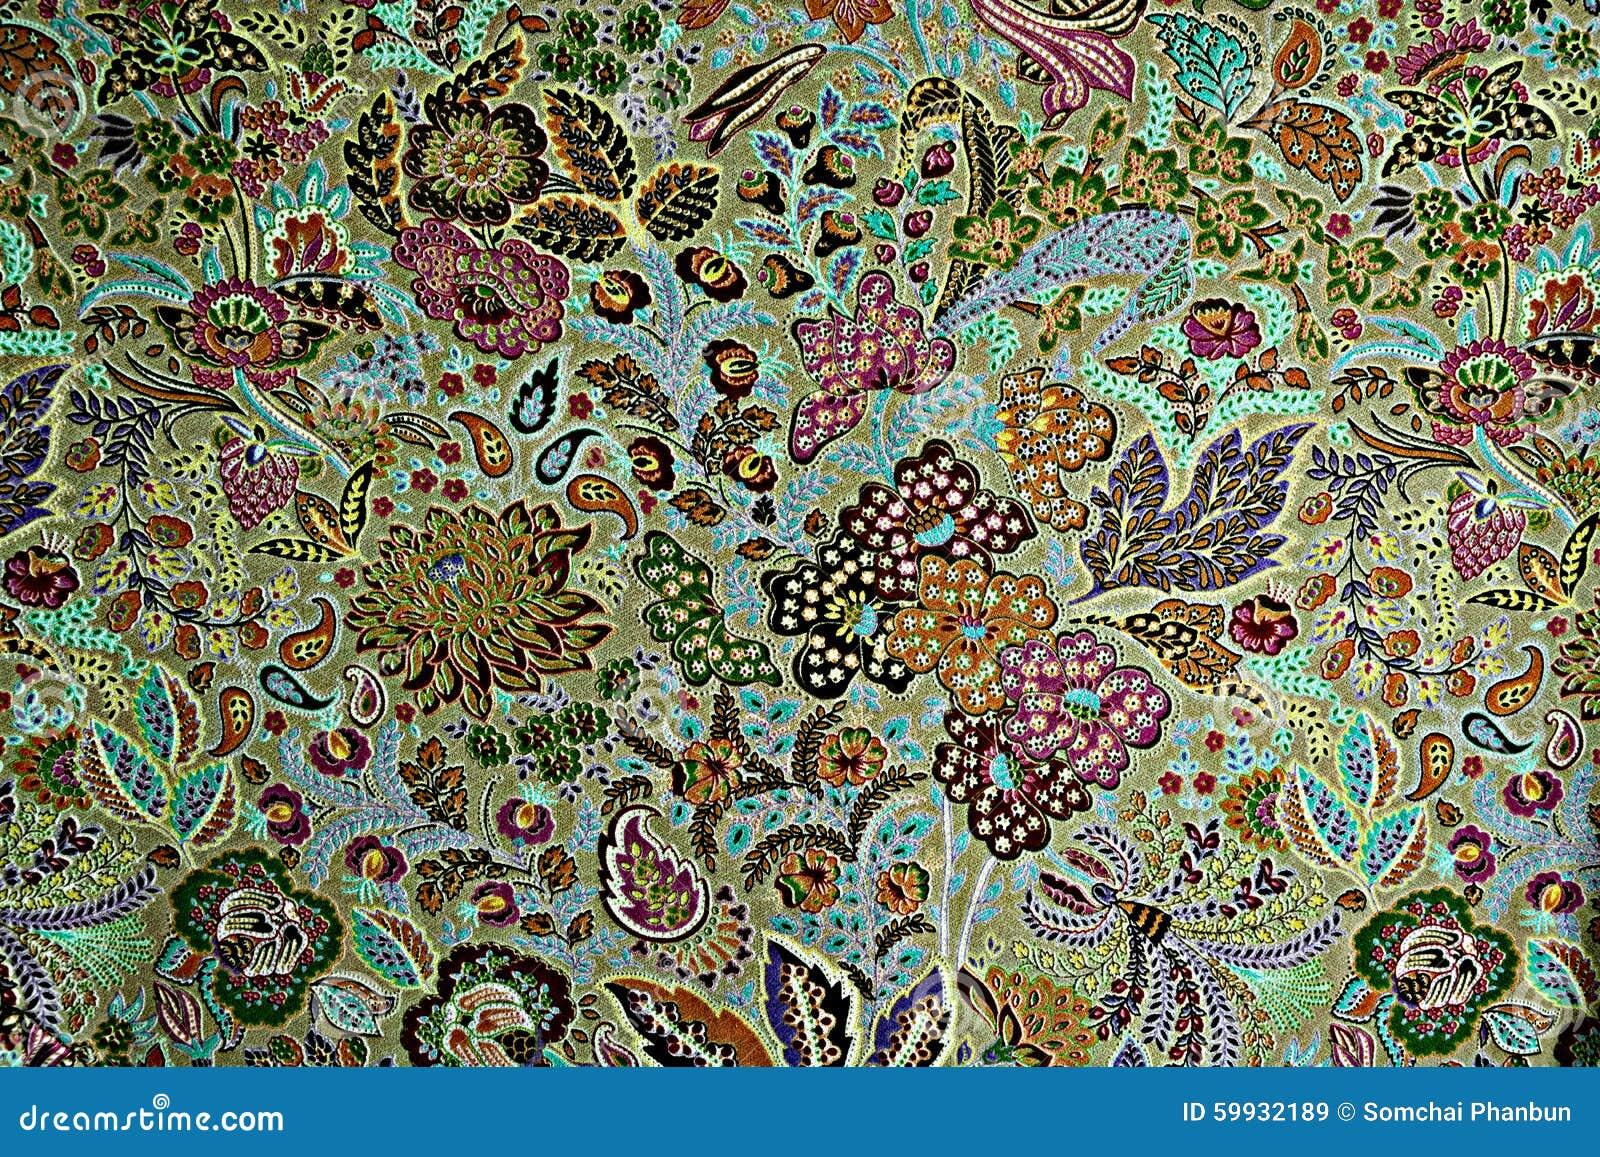 la texture du tissu d 39 impression barre les fleurs. Black Bedroom Furniture Sets. Home Design Ideas